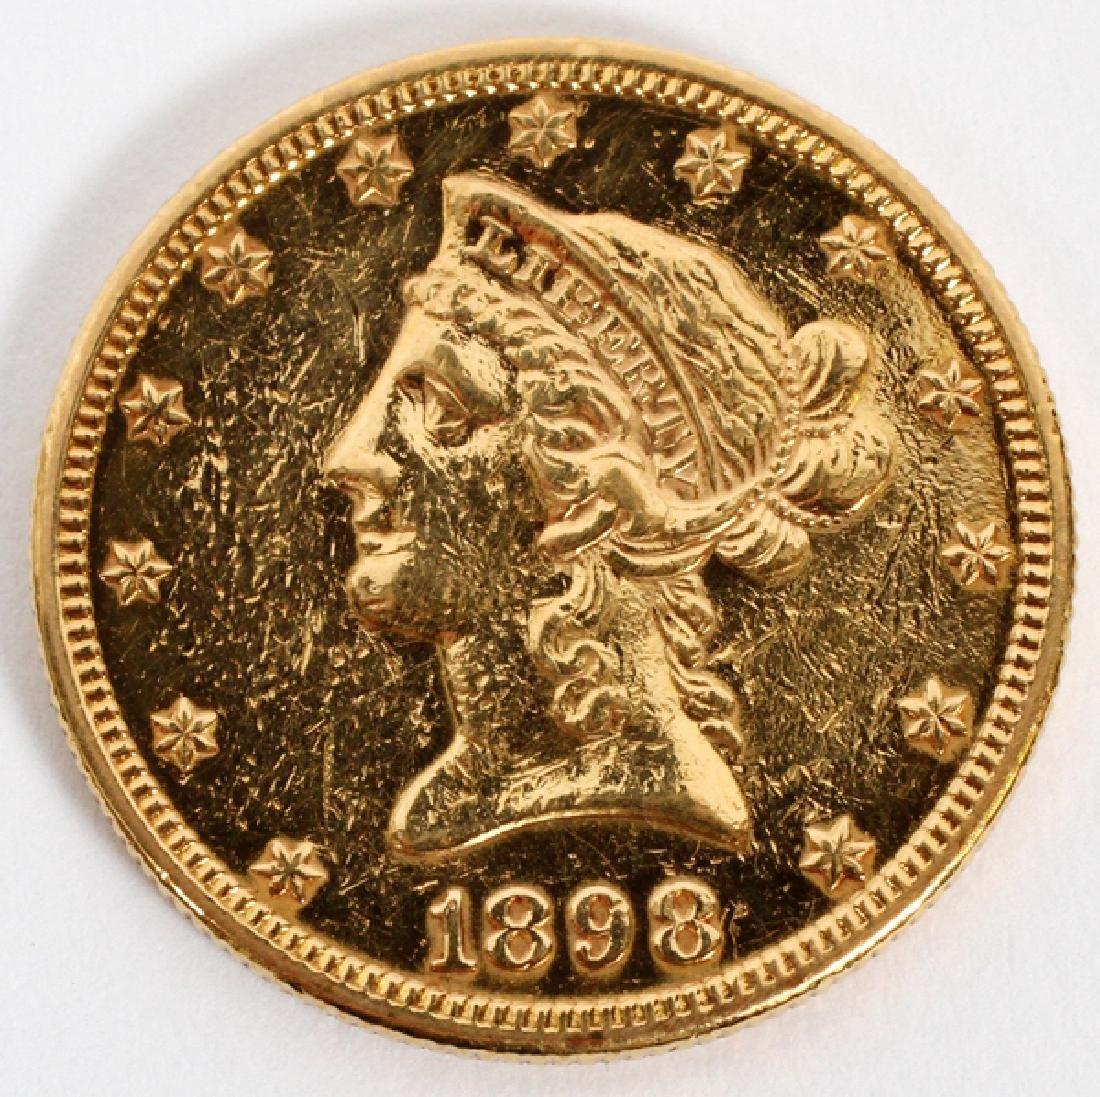 U.S. 1898-S $10.DOLLAR LIBERTY HEAD & EAGLE COIN